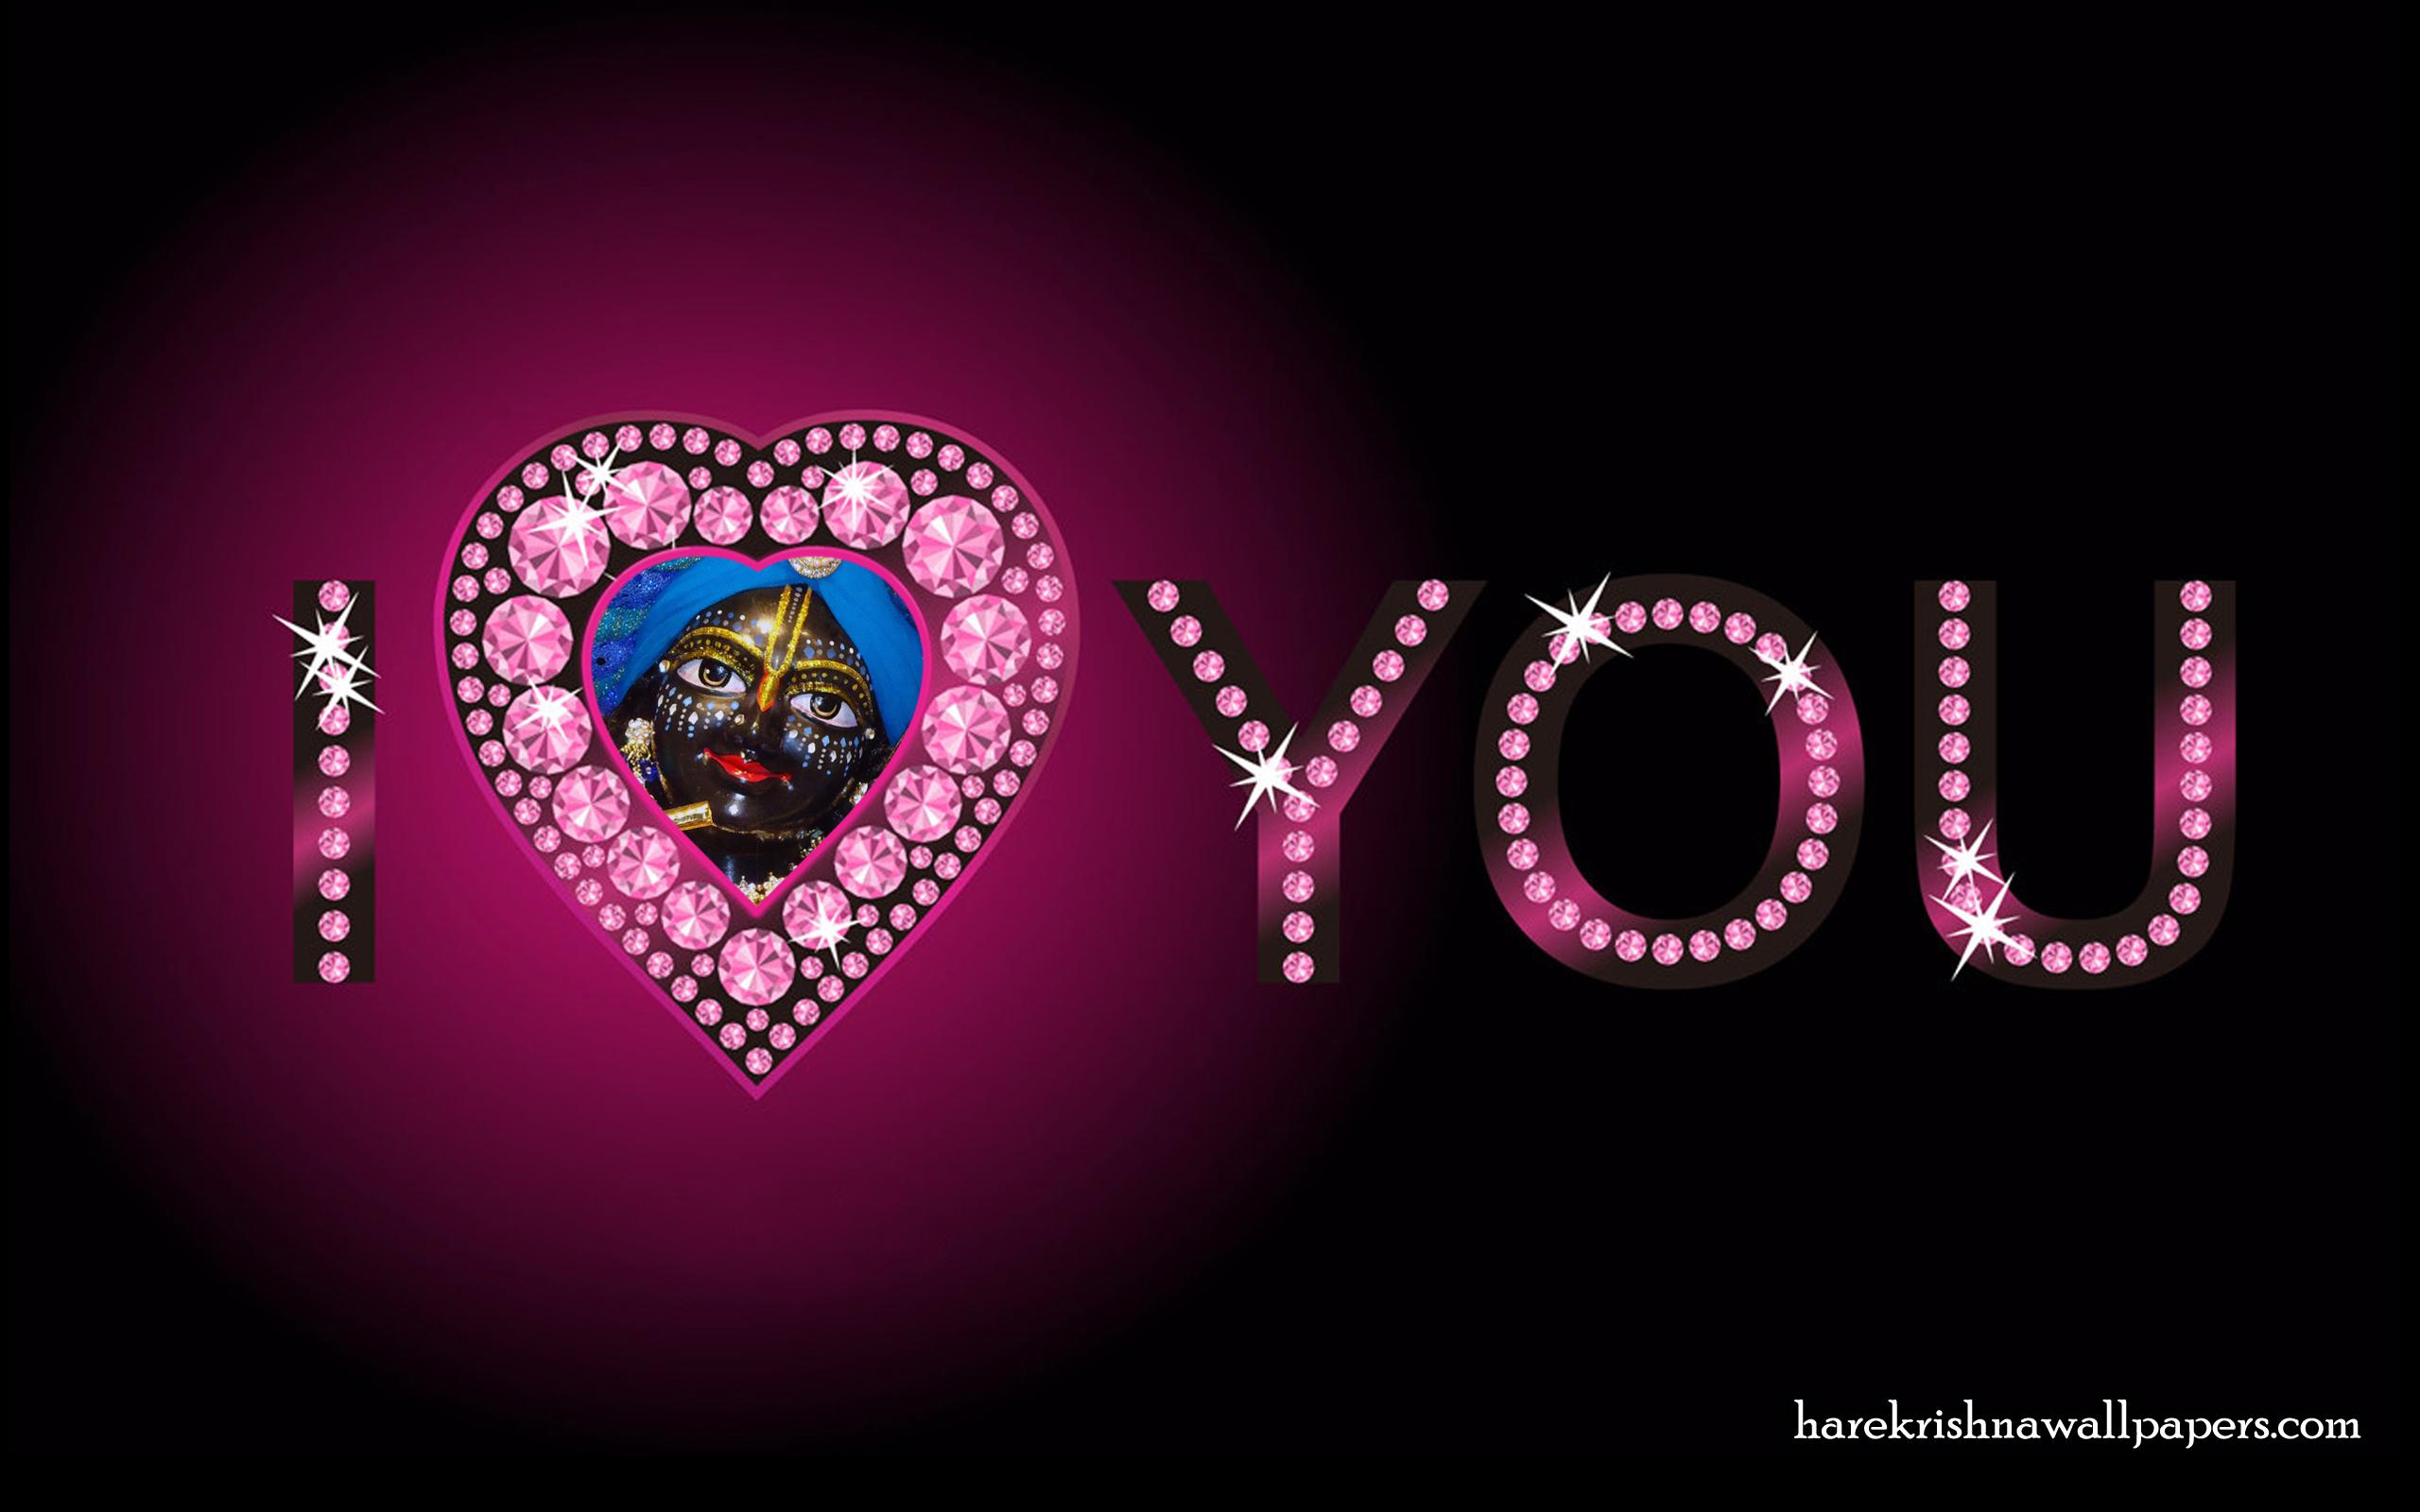 I Love You Gokulananda Wallpaper (006) Size 2560x1600 Download